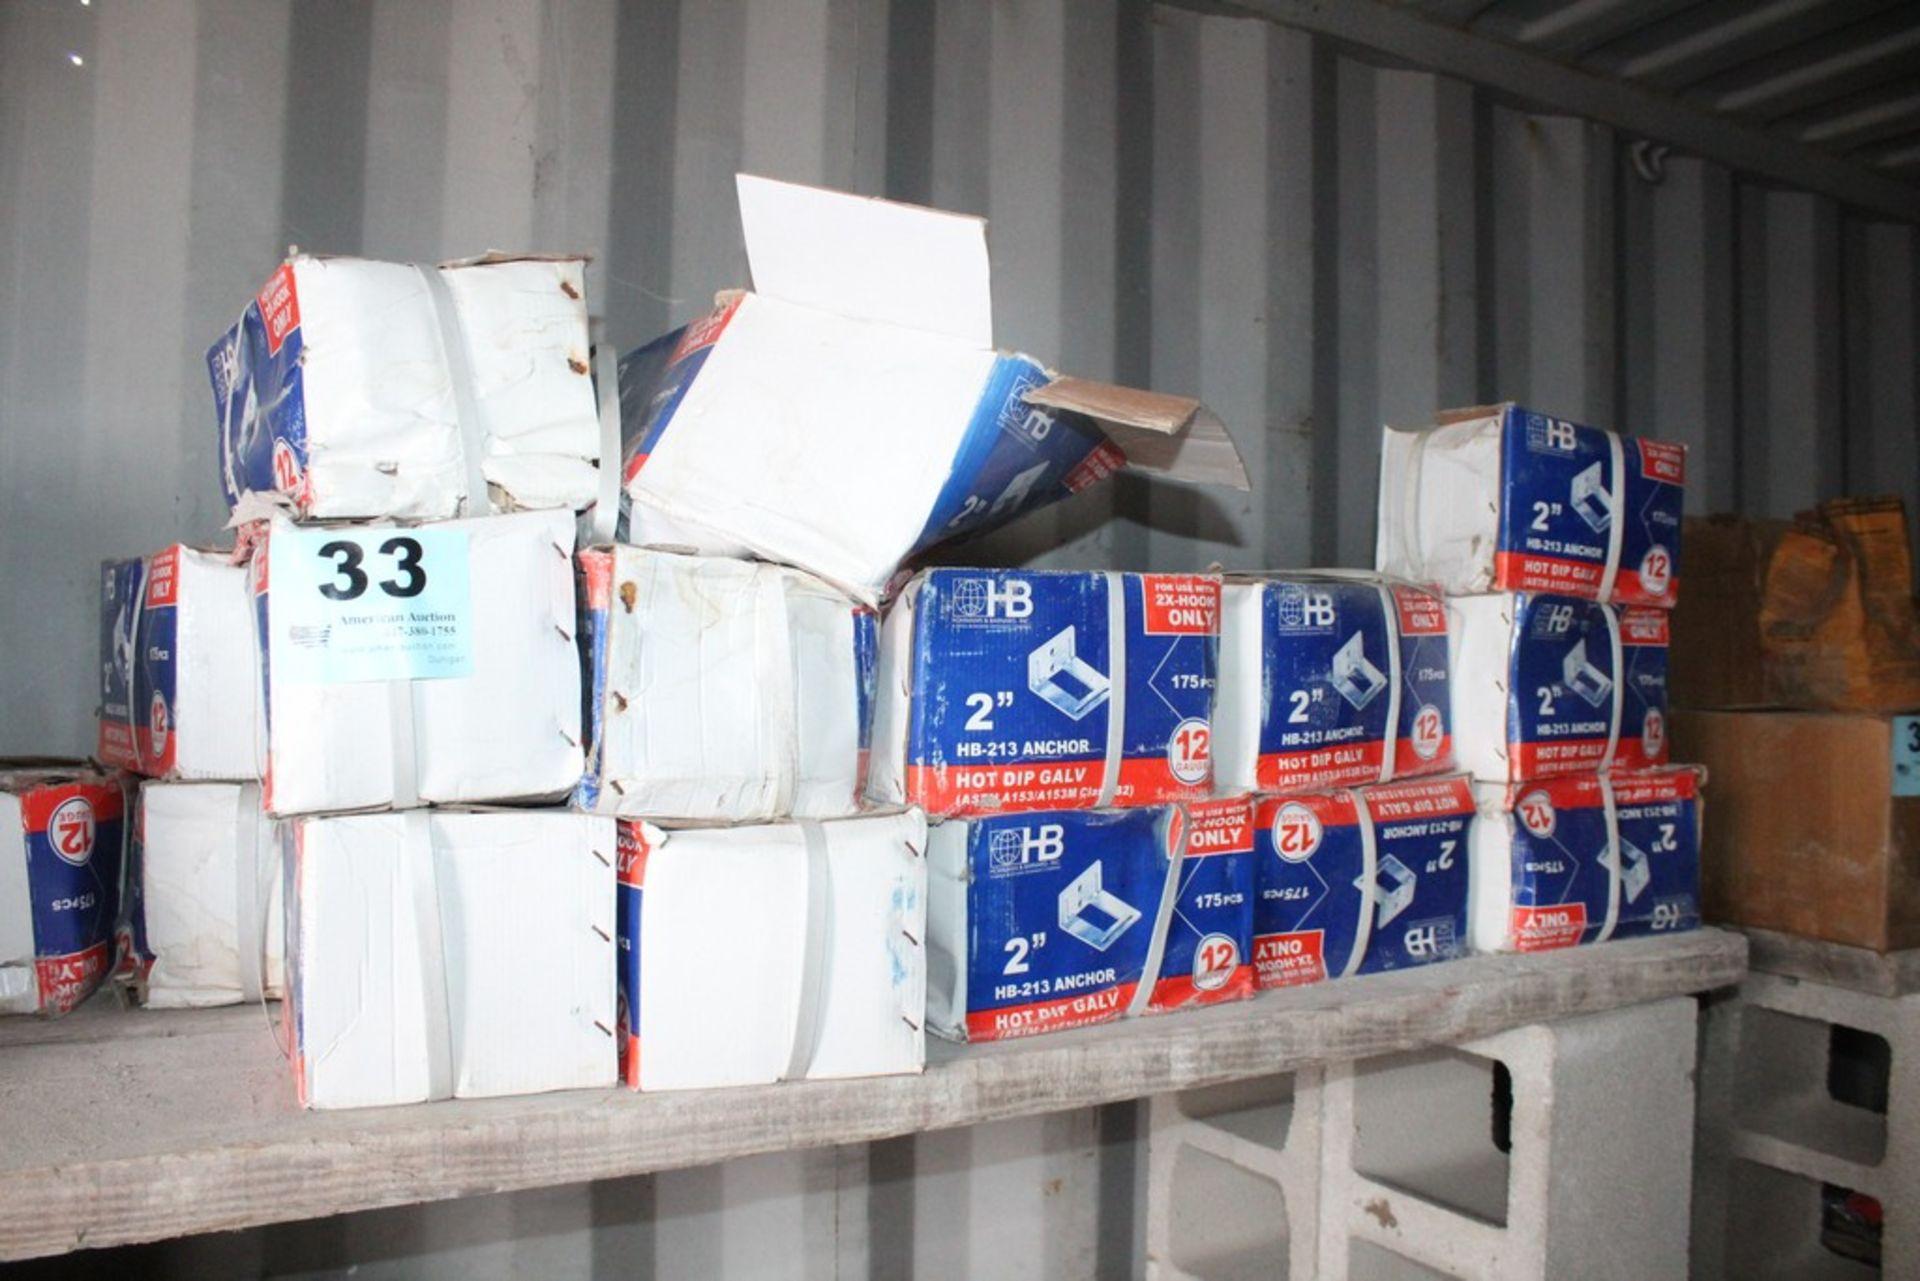 "Lot 33 - (18) BOXES OF HOHMANN & BARNARD HB 213 2"" ADJUSTABLE VENEER ANCHORS 175 PER BOX"